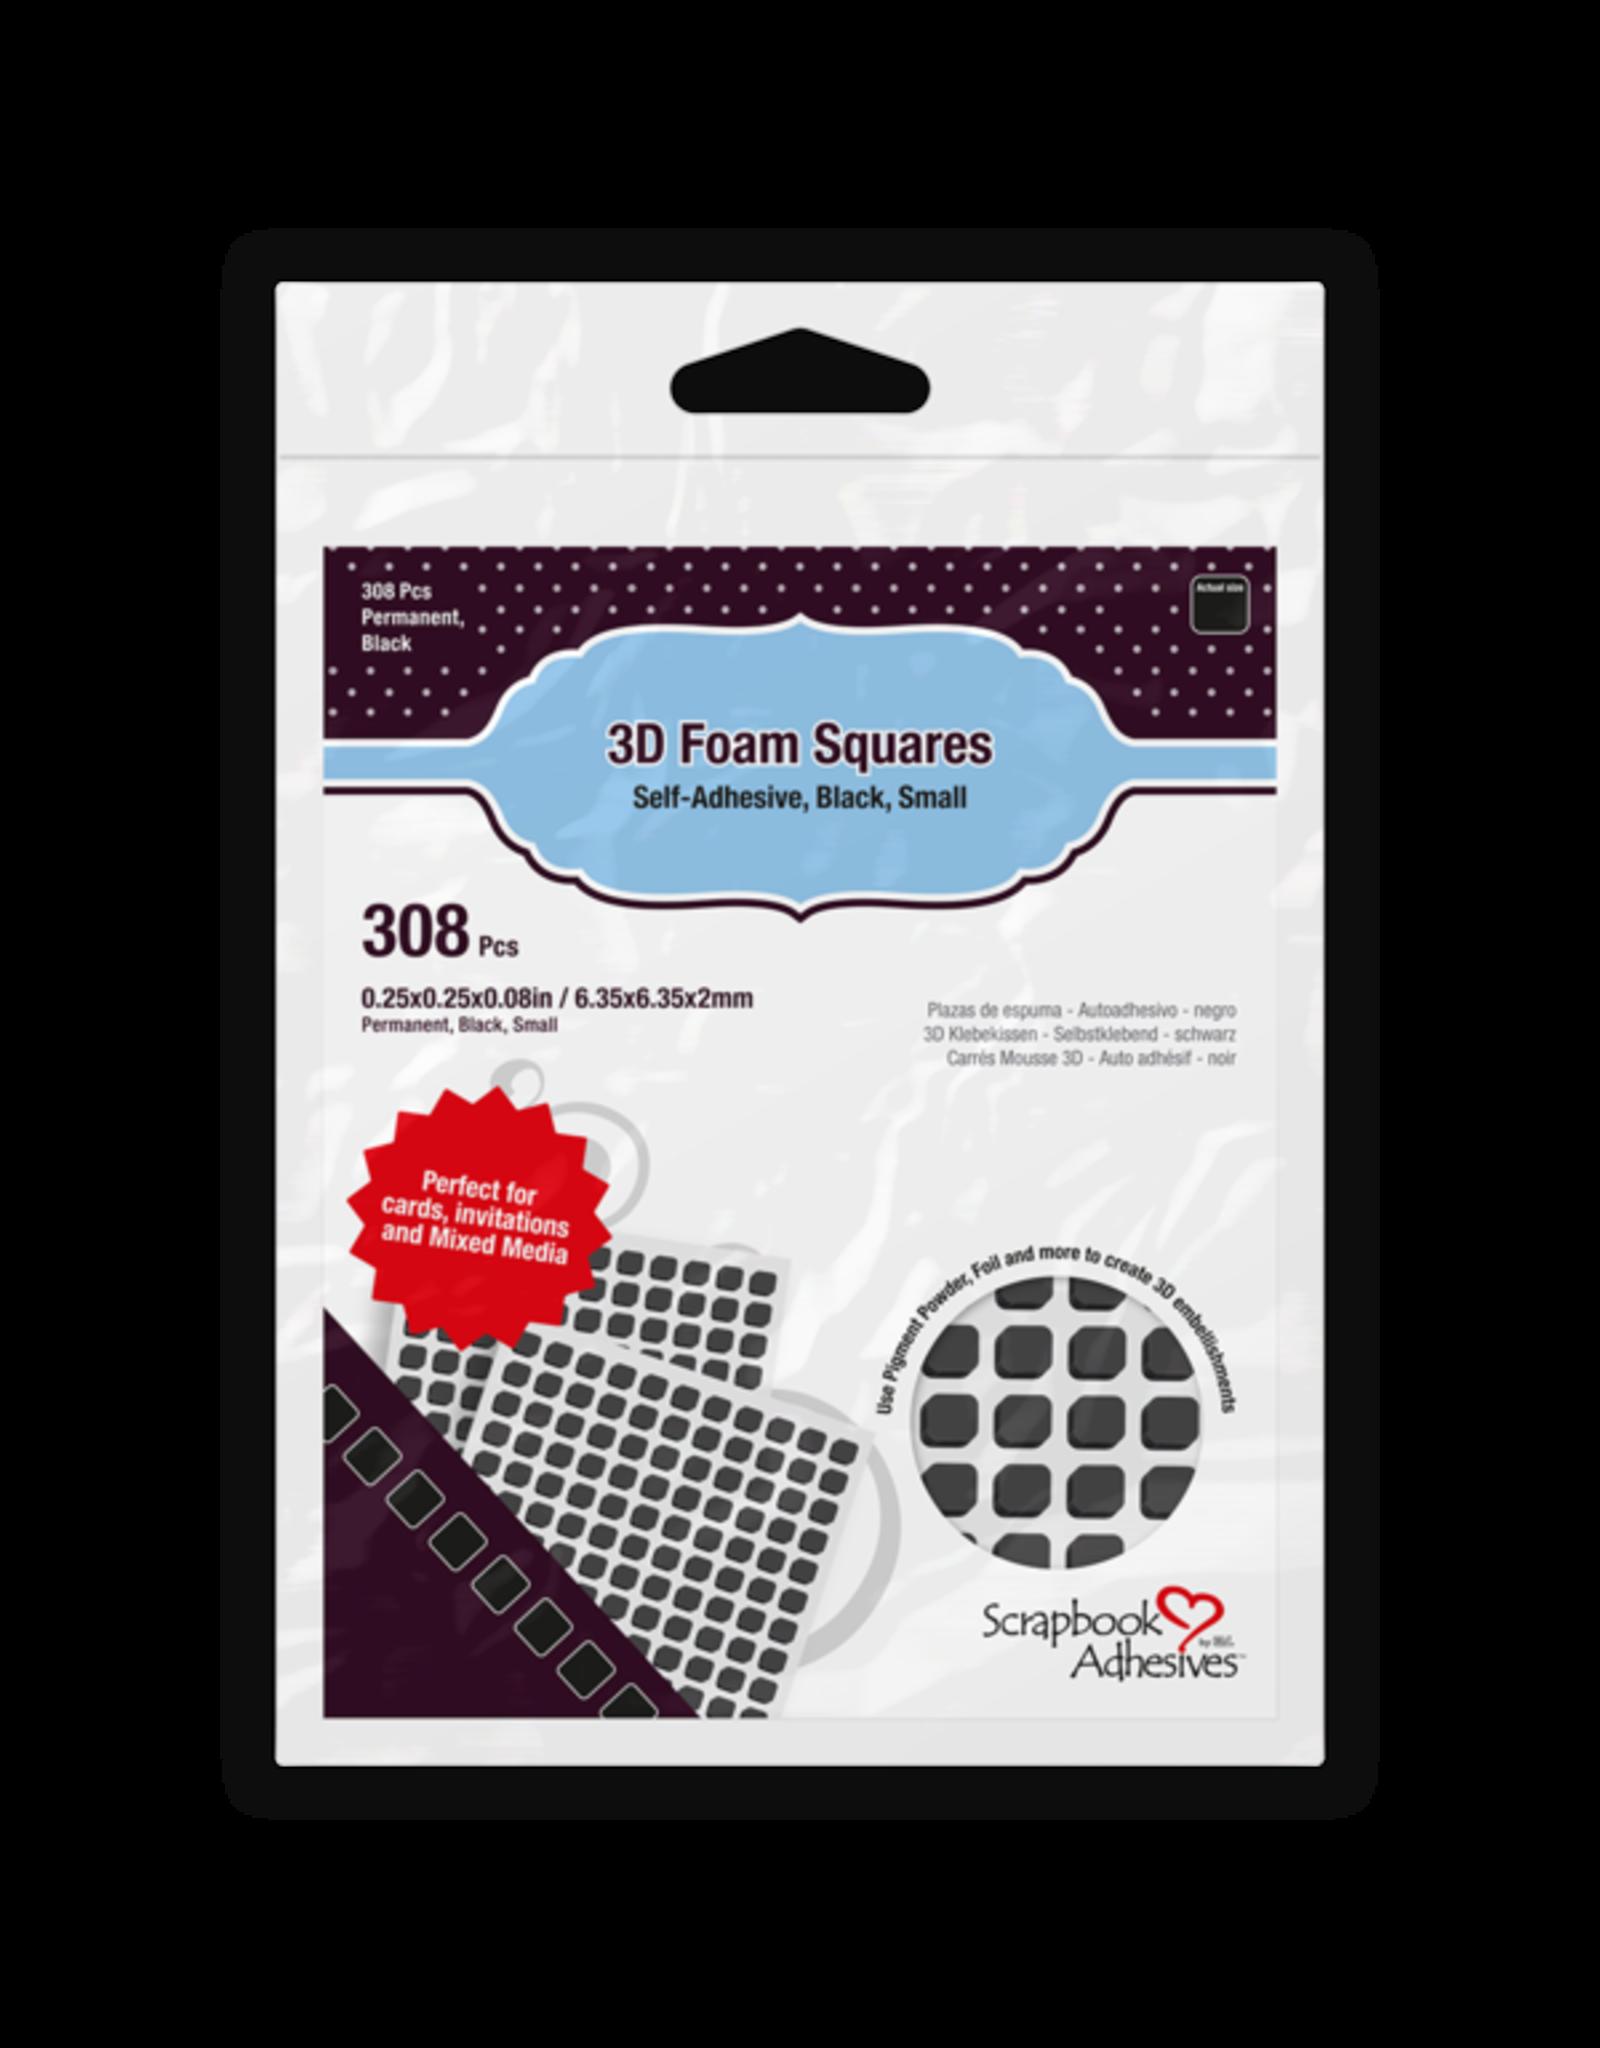 Scrapbook Adhesives 3D Foam Squares  Black - Small